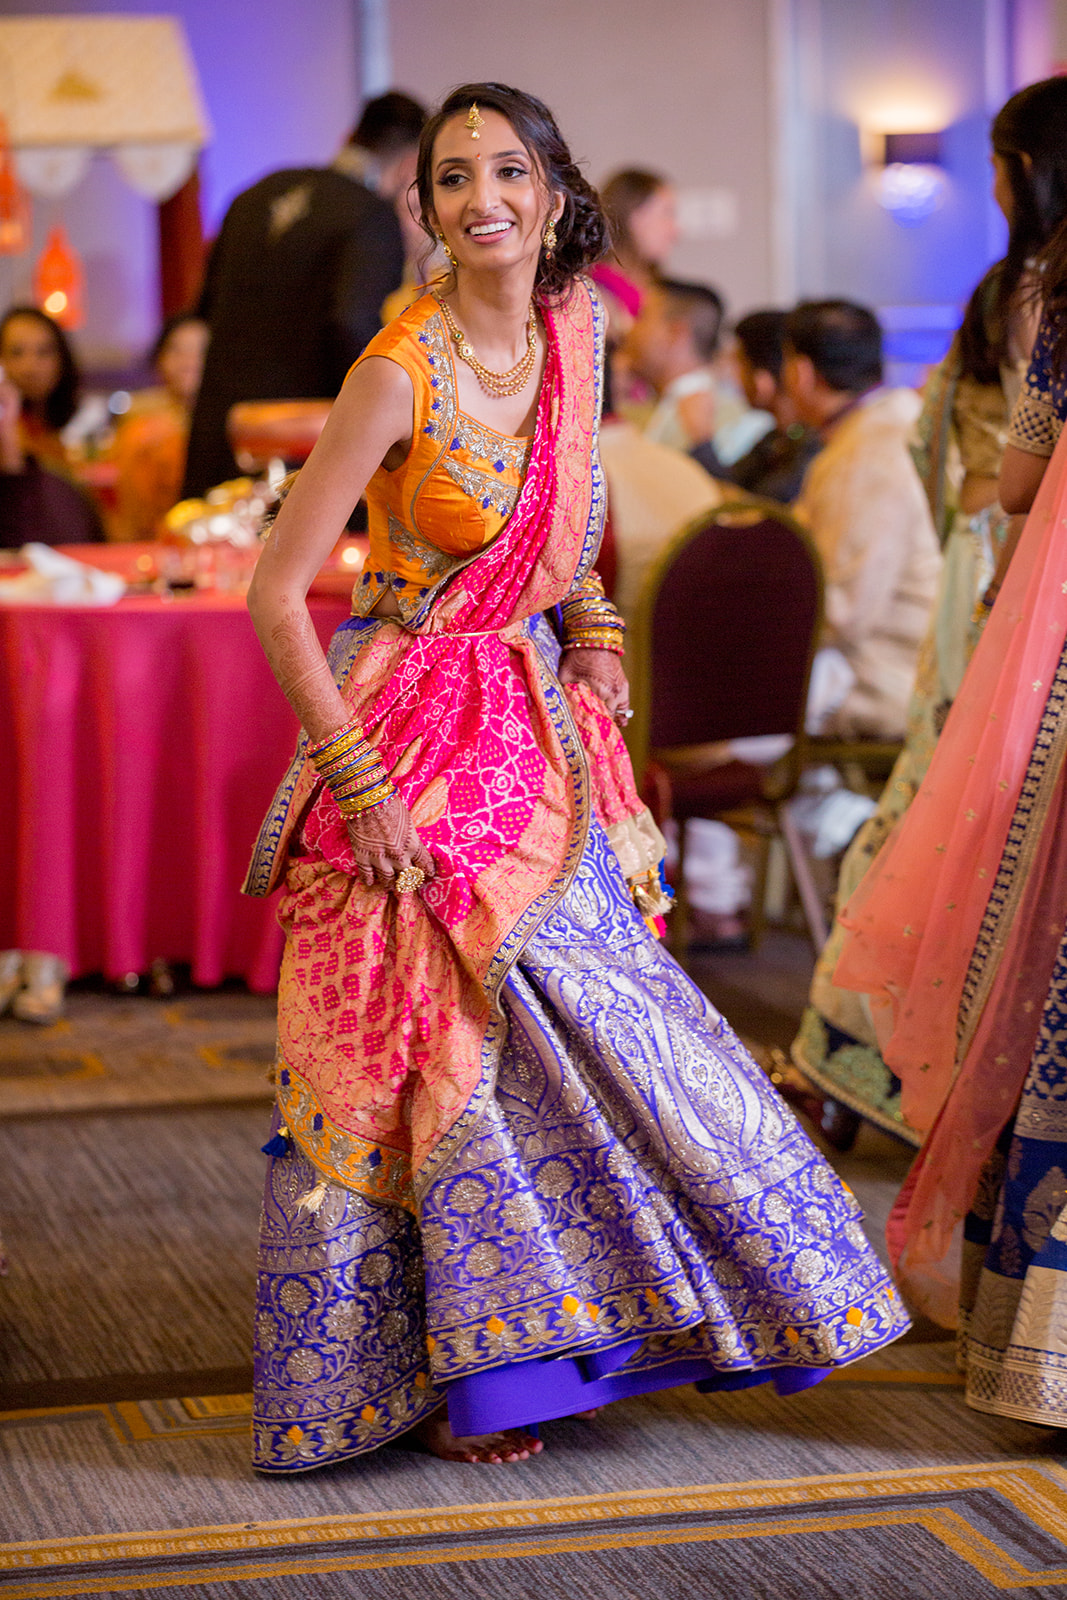 Le Cape Weddings - Monica and Pratik - Sangeet 00410.jpg